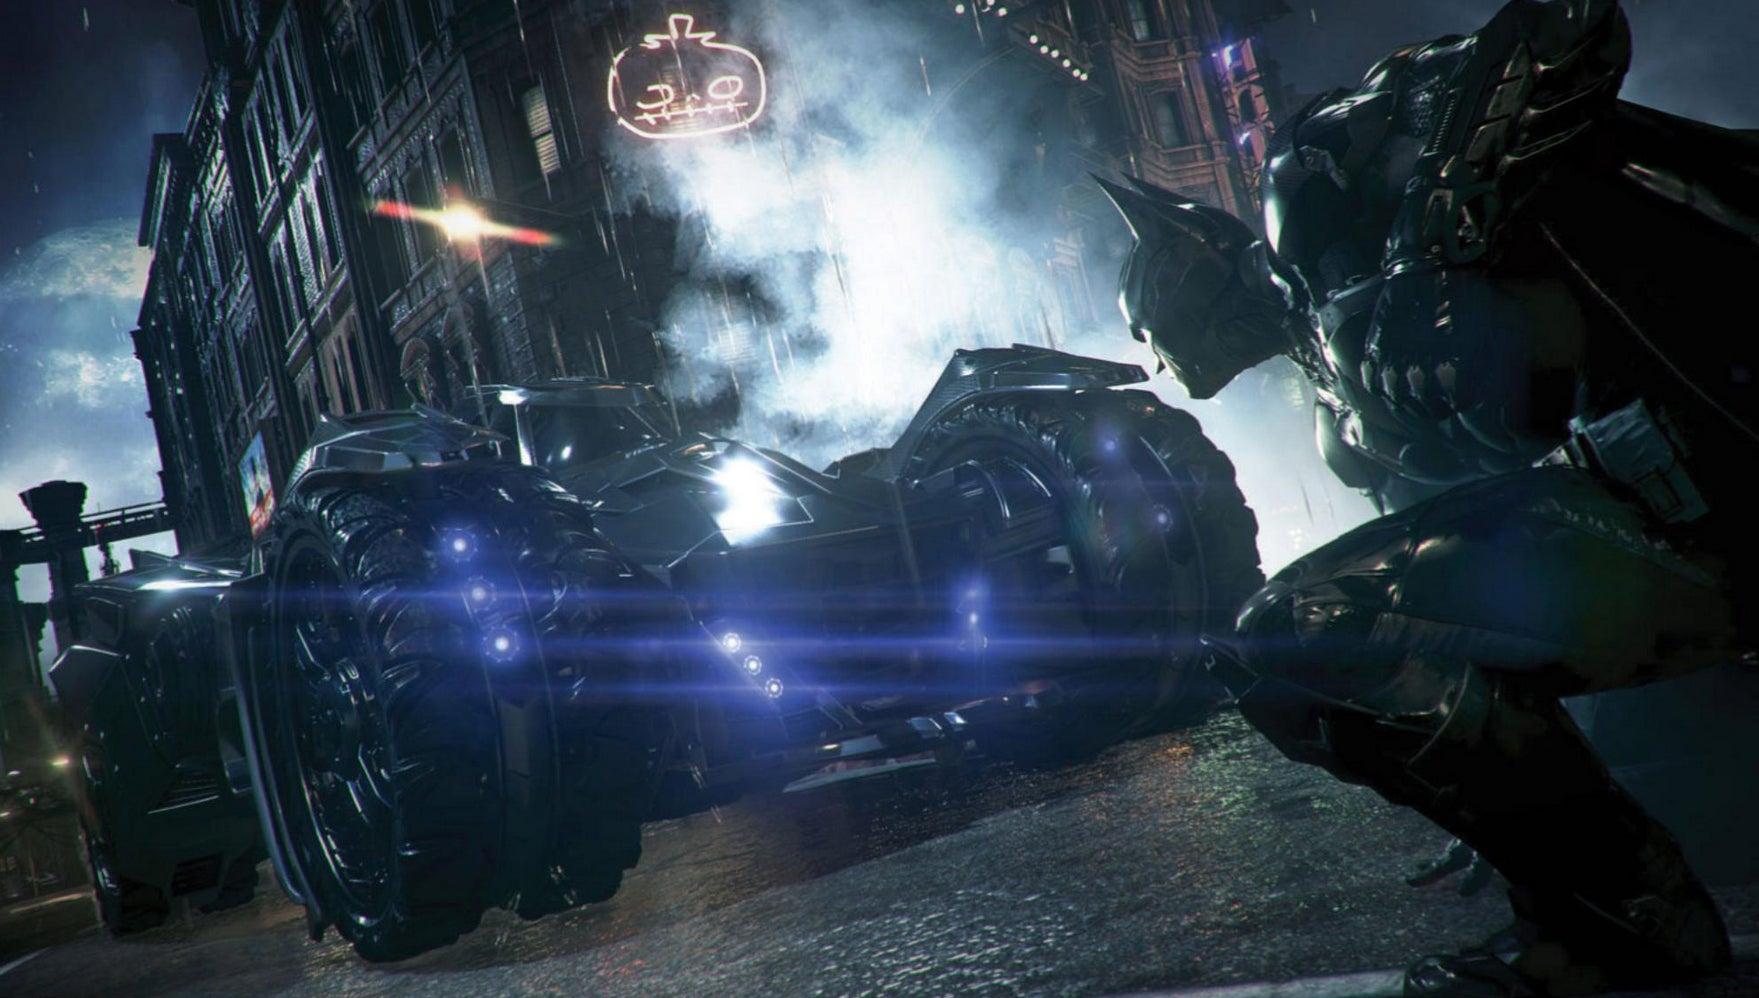 Image for New Batman: Arkham Knight screenshots show off Batmobile, bad guys